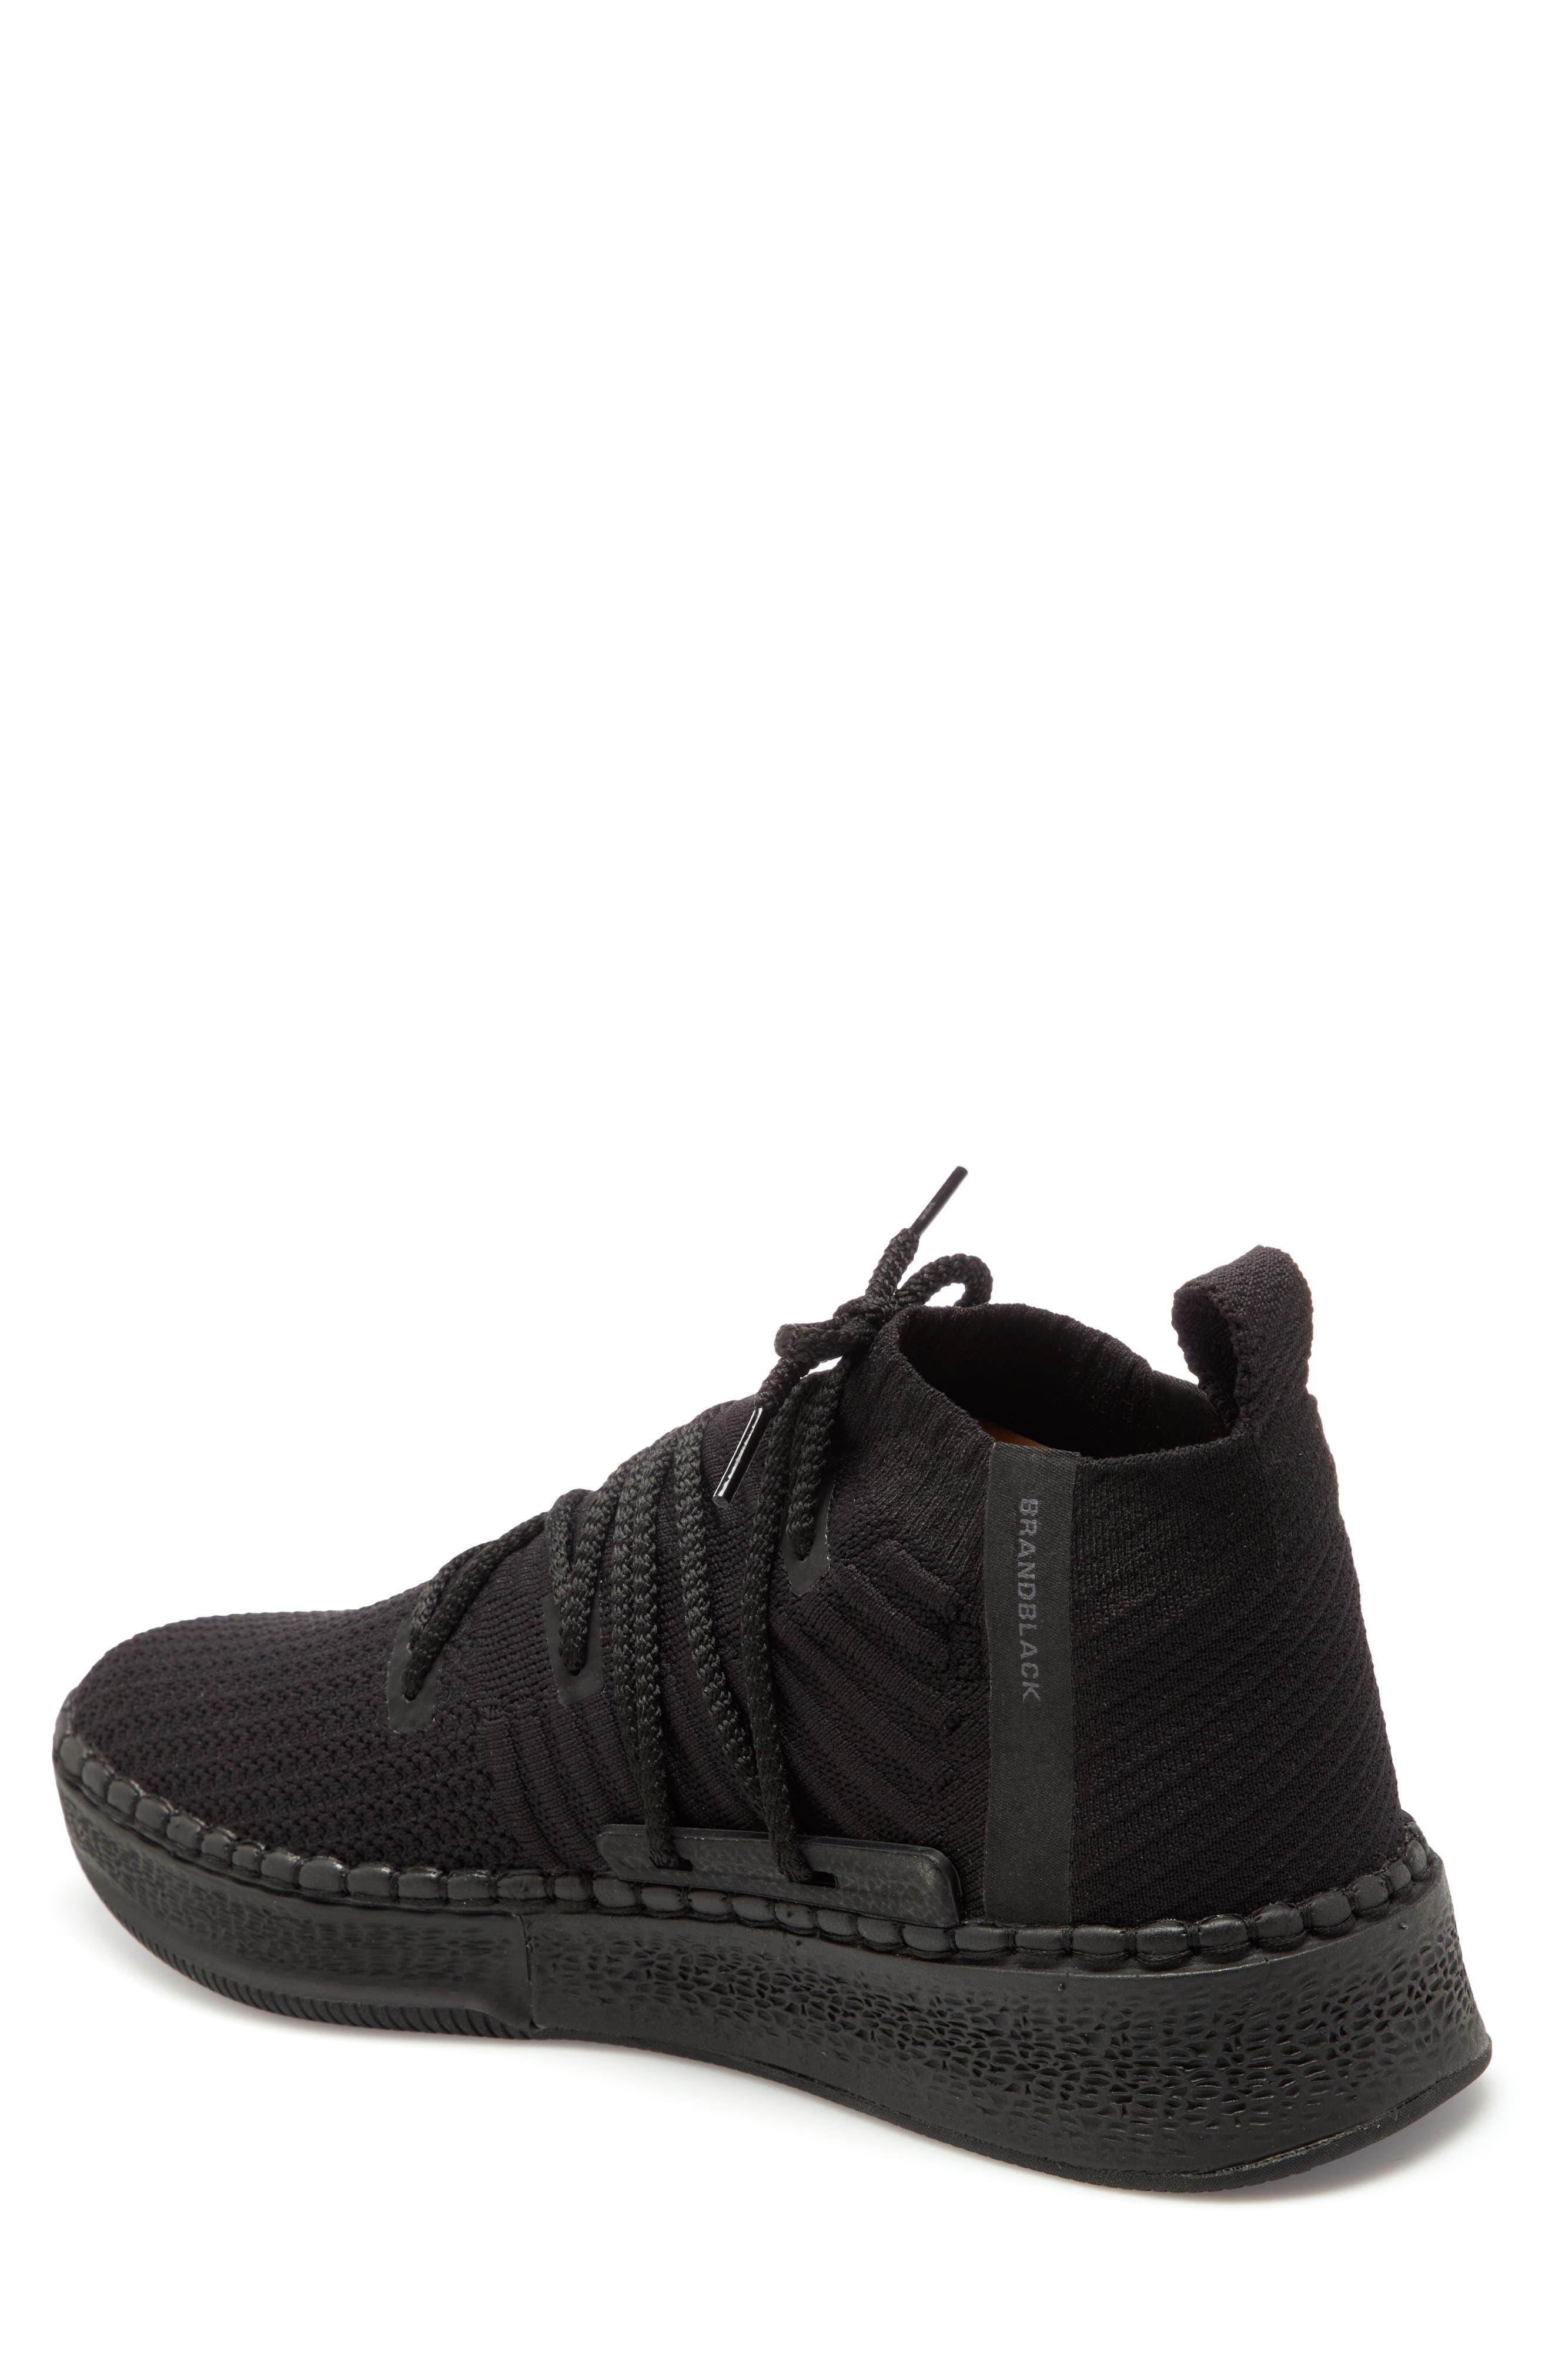 Delta Sneaker,                             Alternate thumbnail 2, color,                             Black